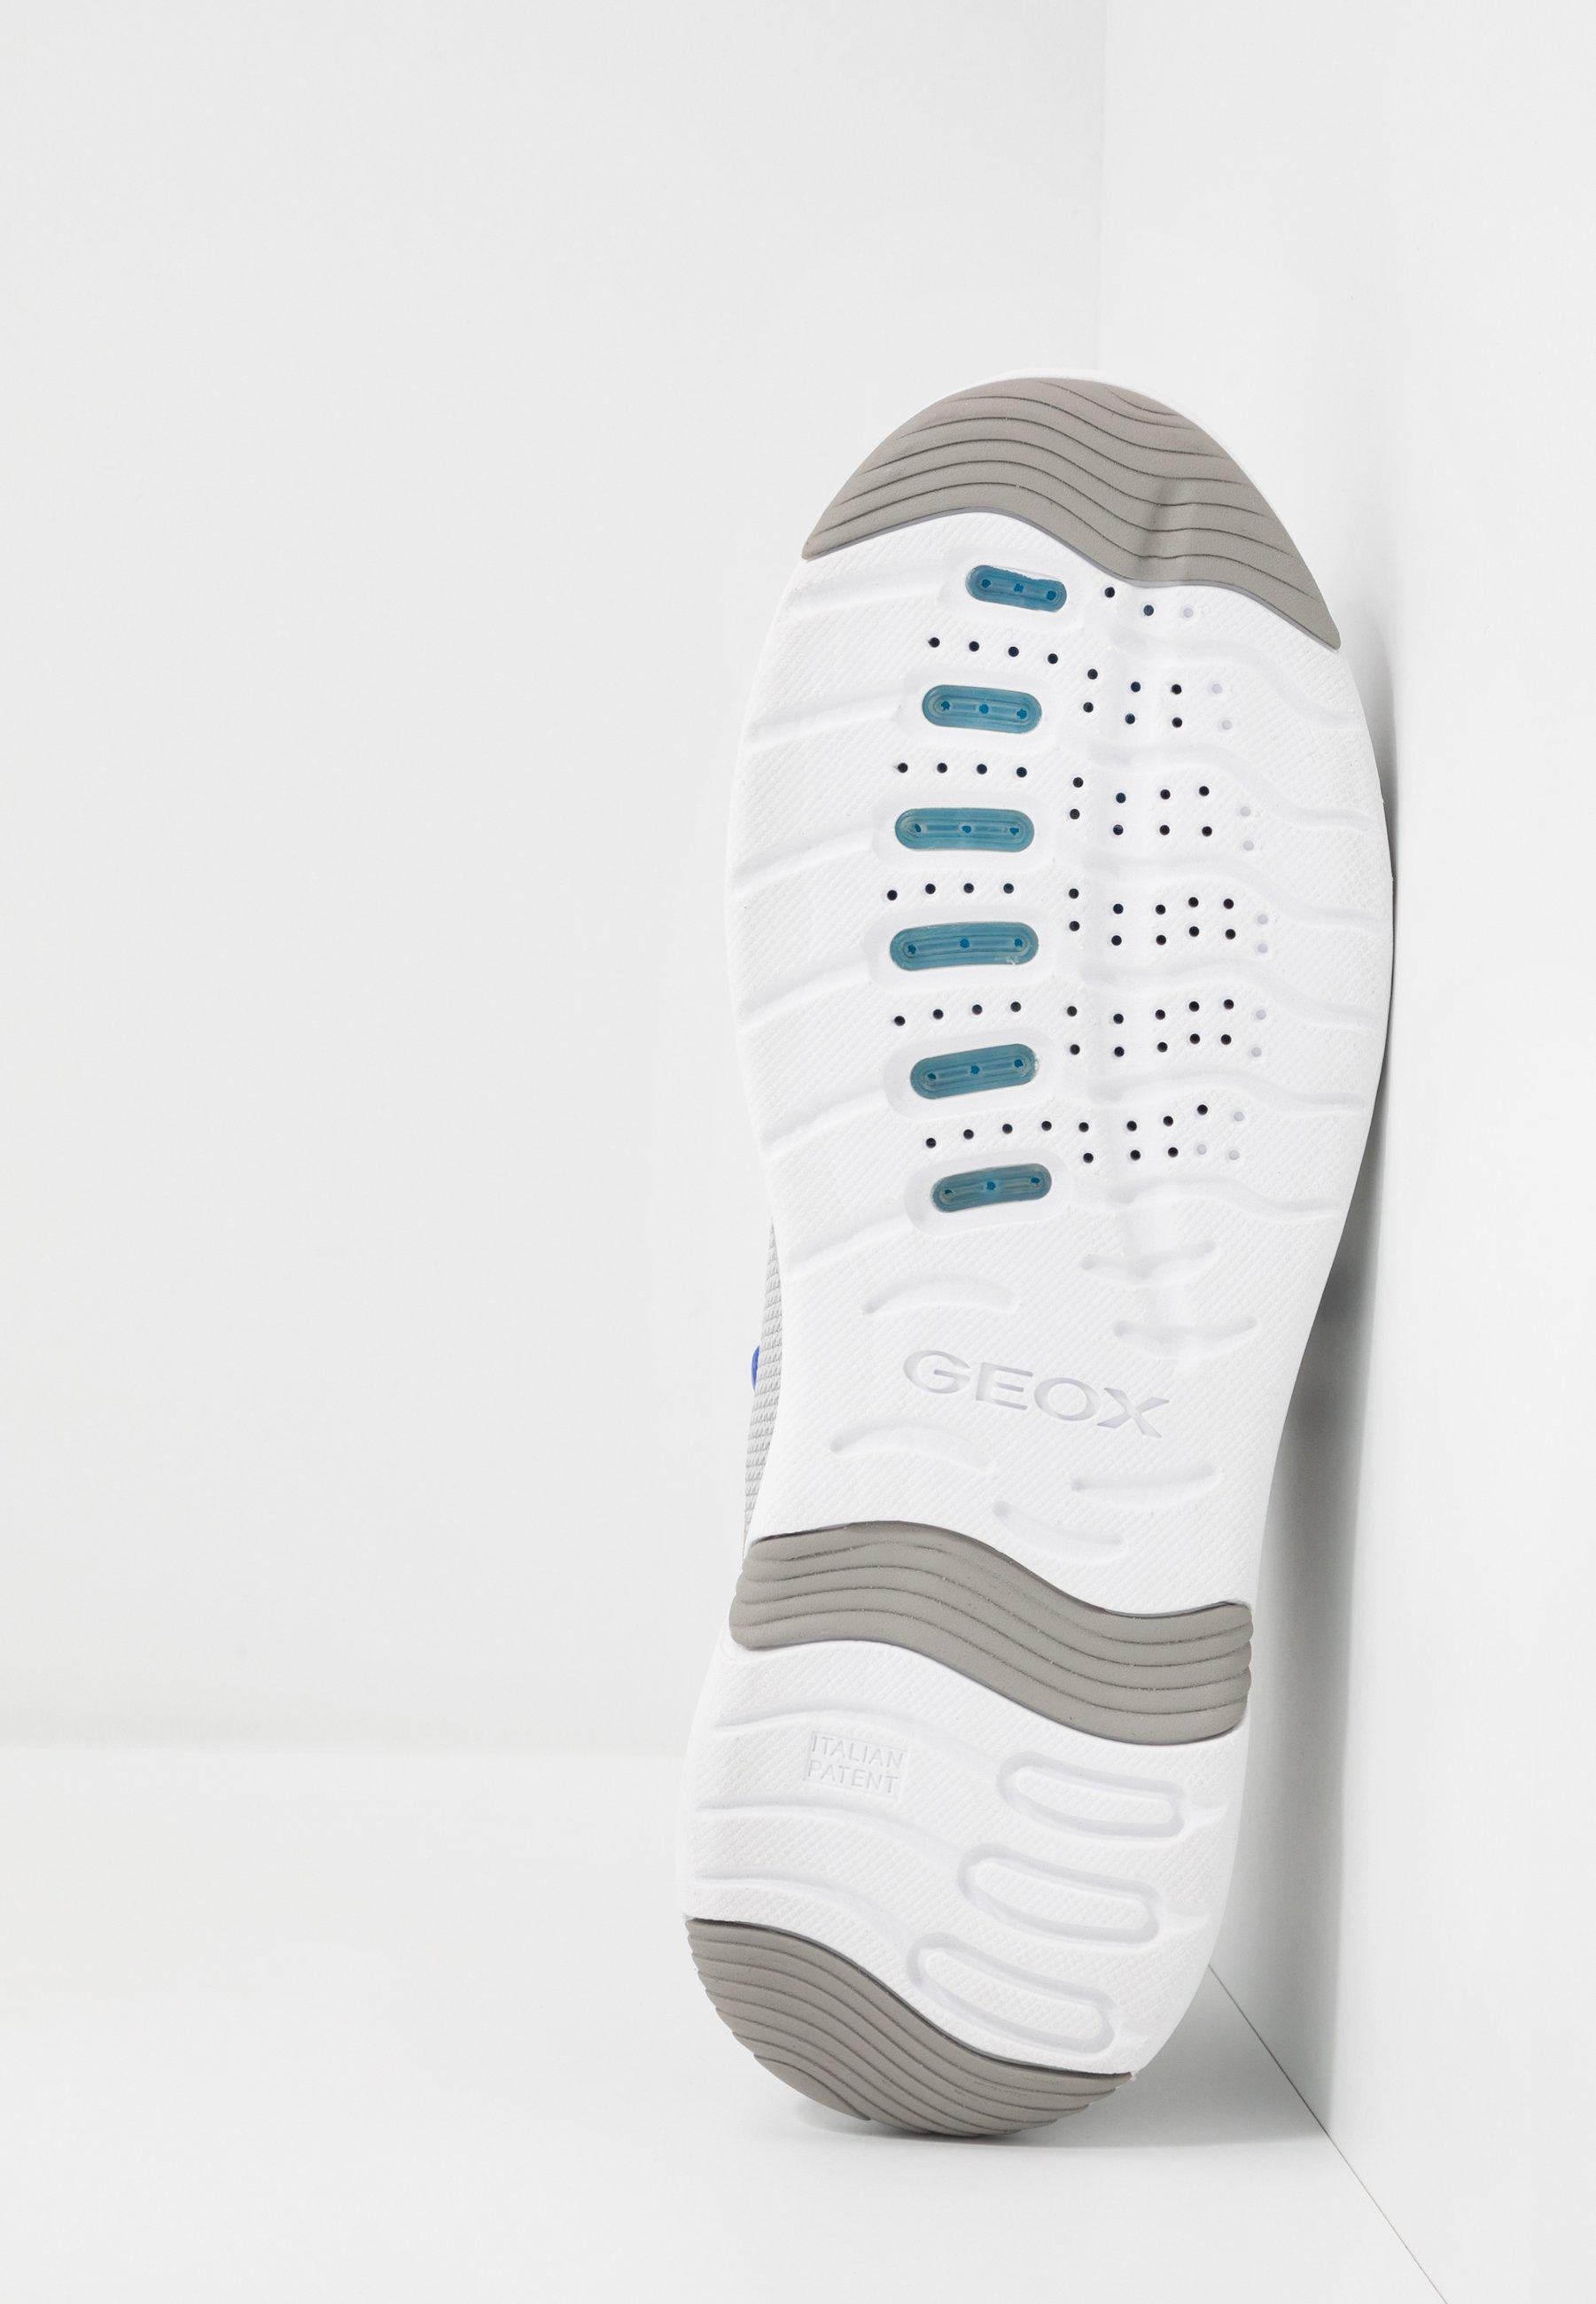 Geox LEVITA - Slip-ons - grey